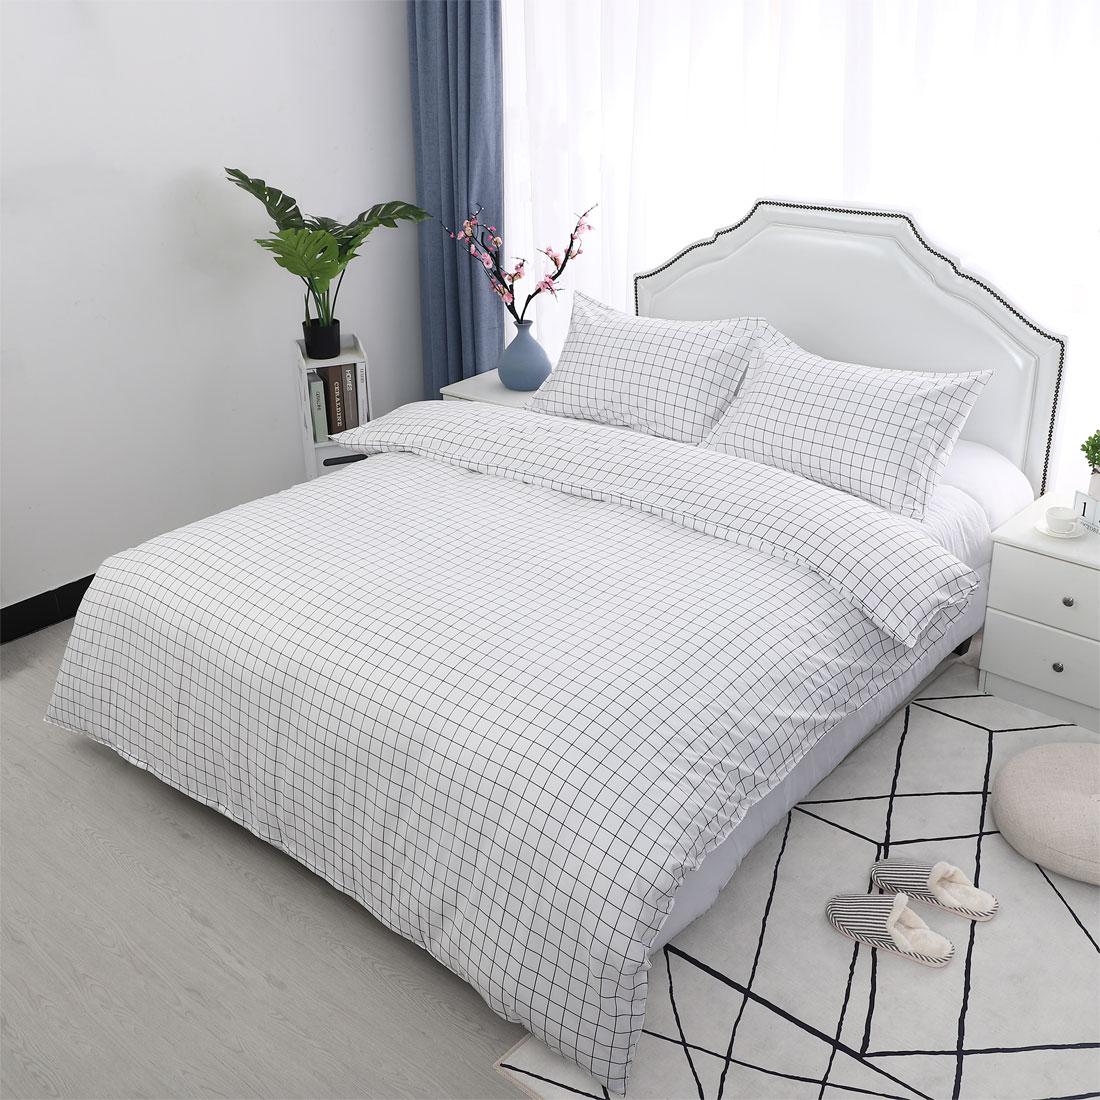 Floral-Bedding-Set-Duvet-Cover-Set-Comforter-Cover-Single-Full-Queen-King-4-Size thumbnail 14